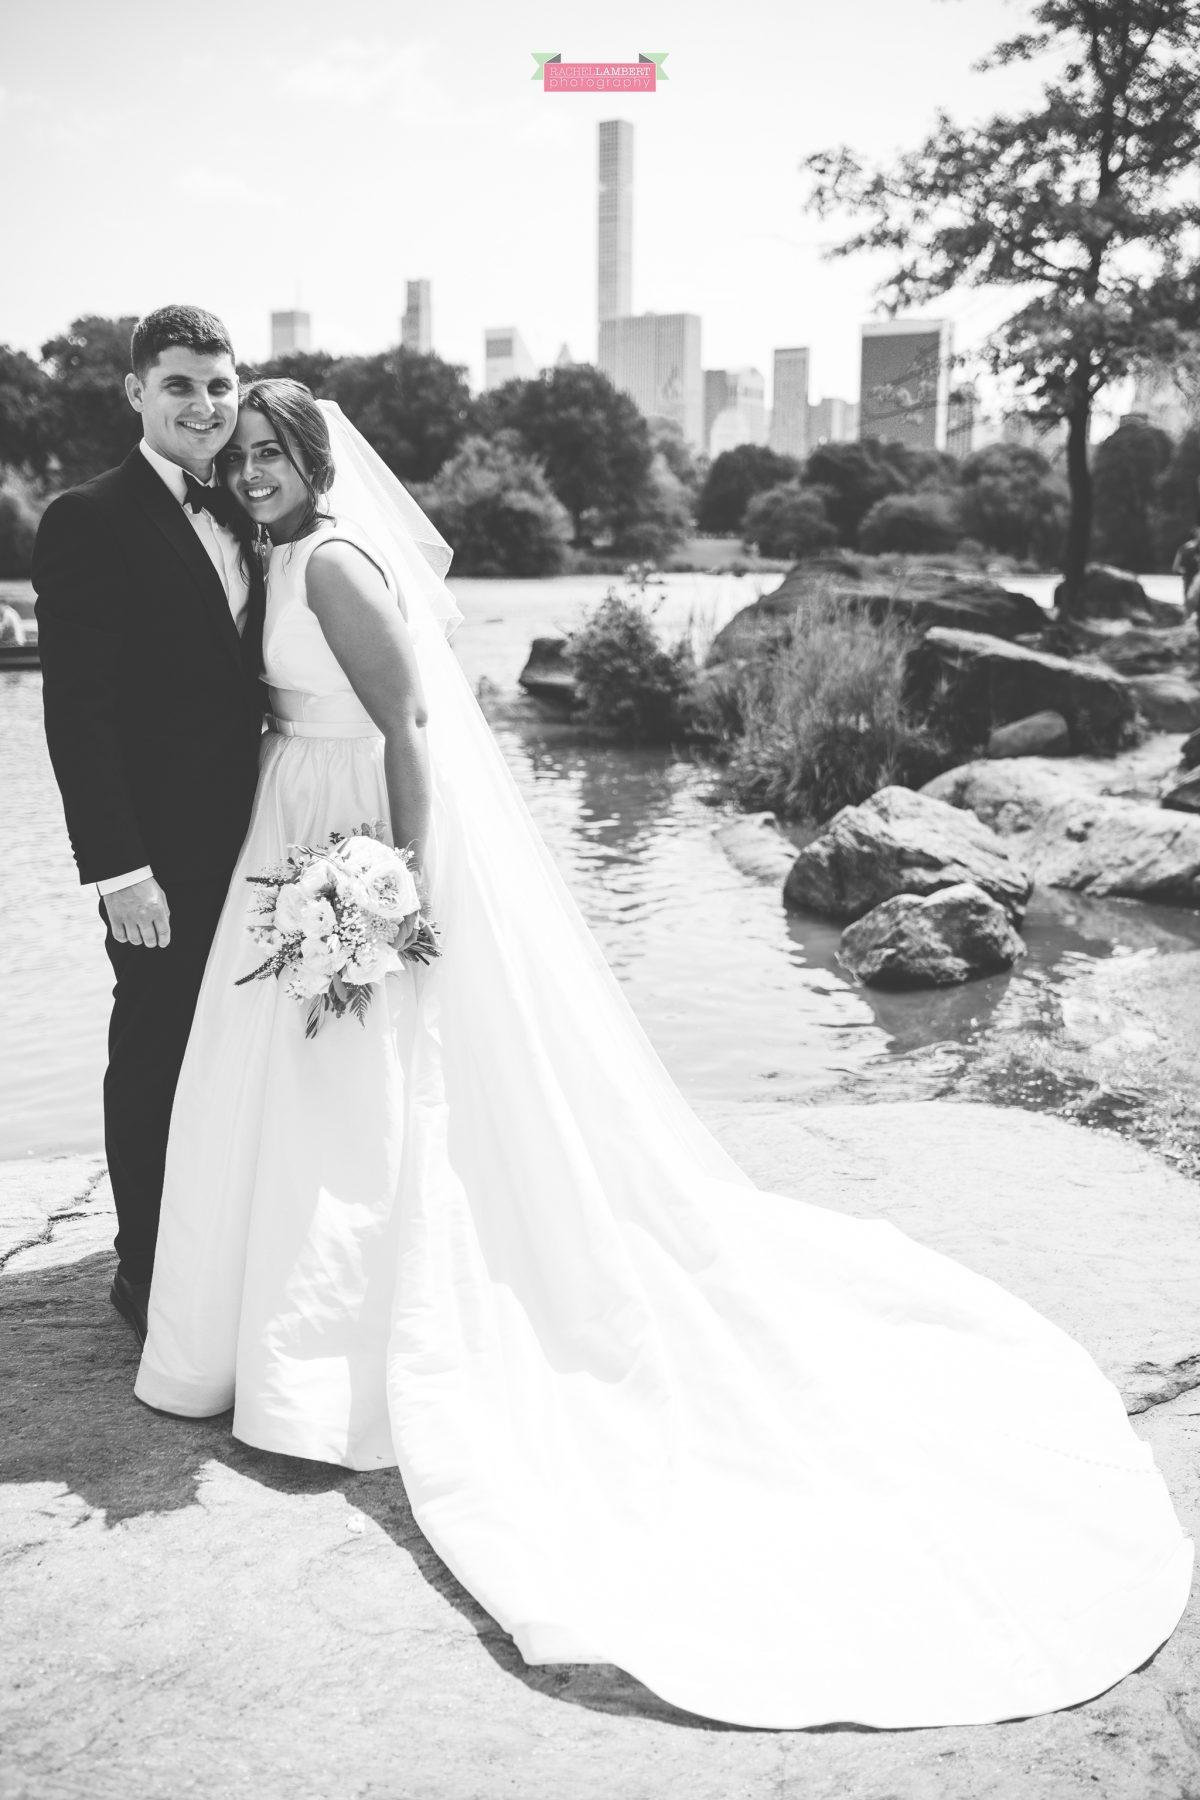 rachel lambert photography new york wedding photos bride and groom central park the lake